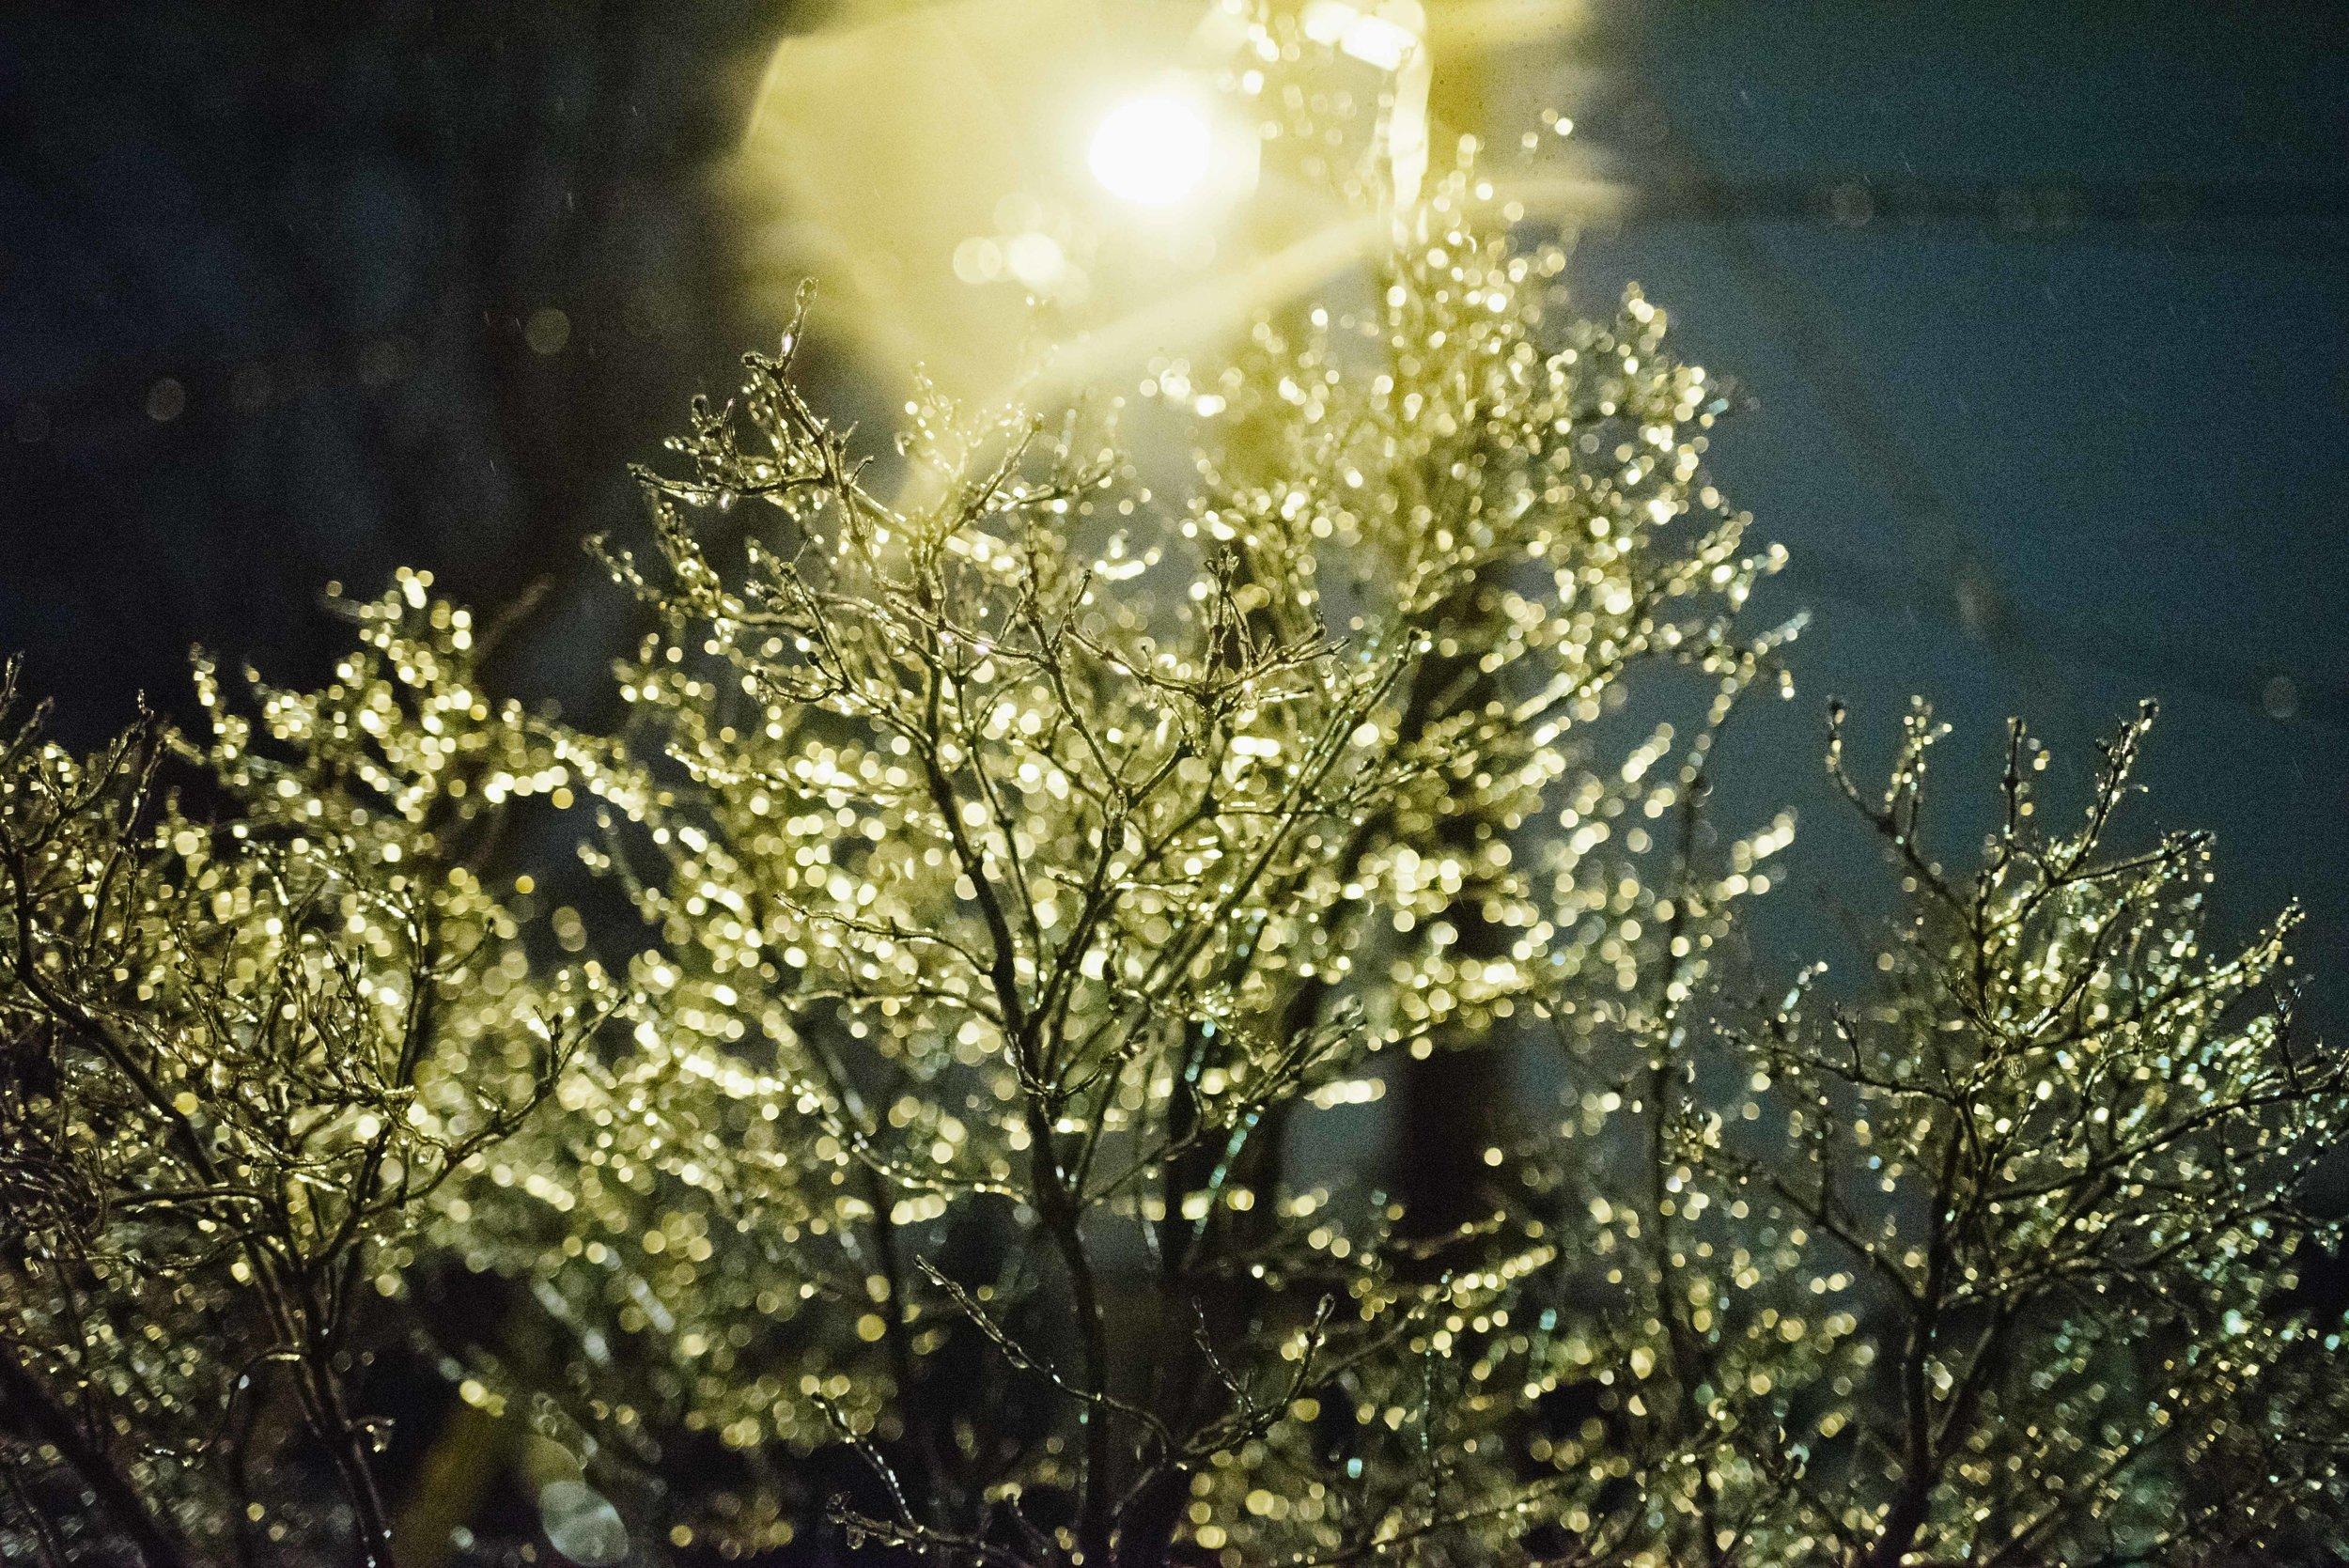 SurrealNightPhotos-3107.jpg